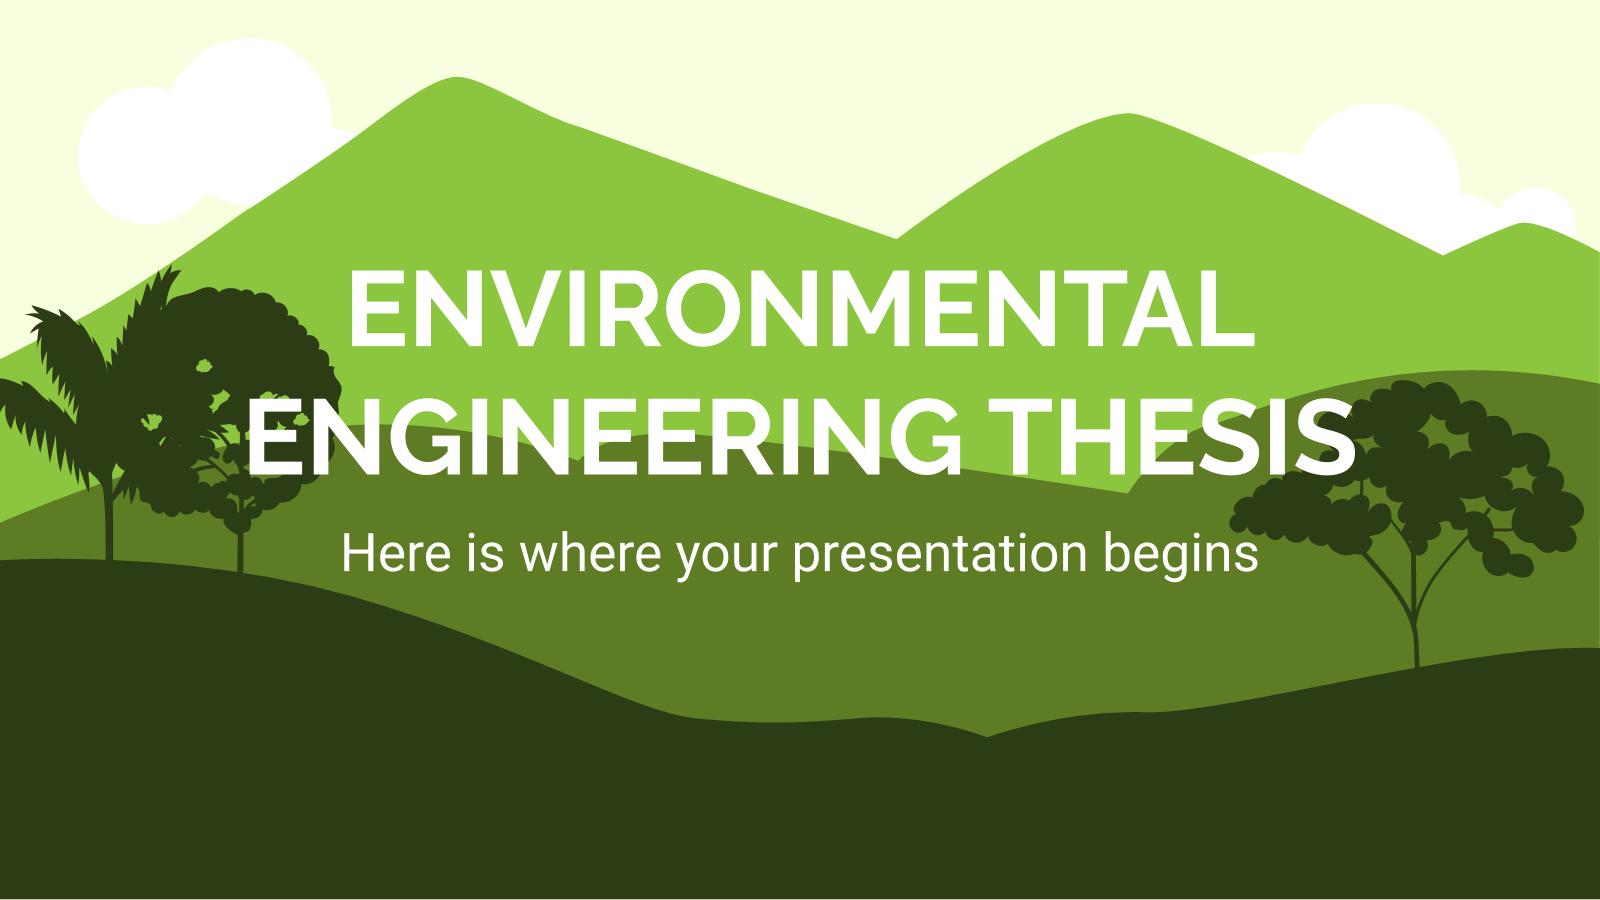 Environmental Engineering Thesis presentation template